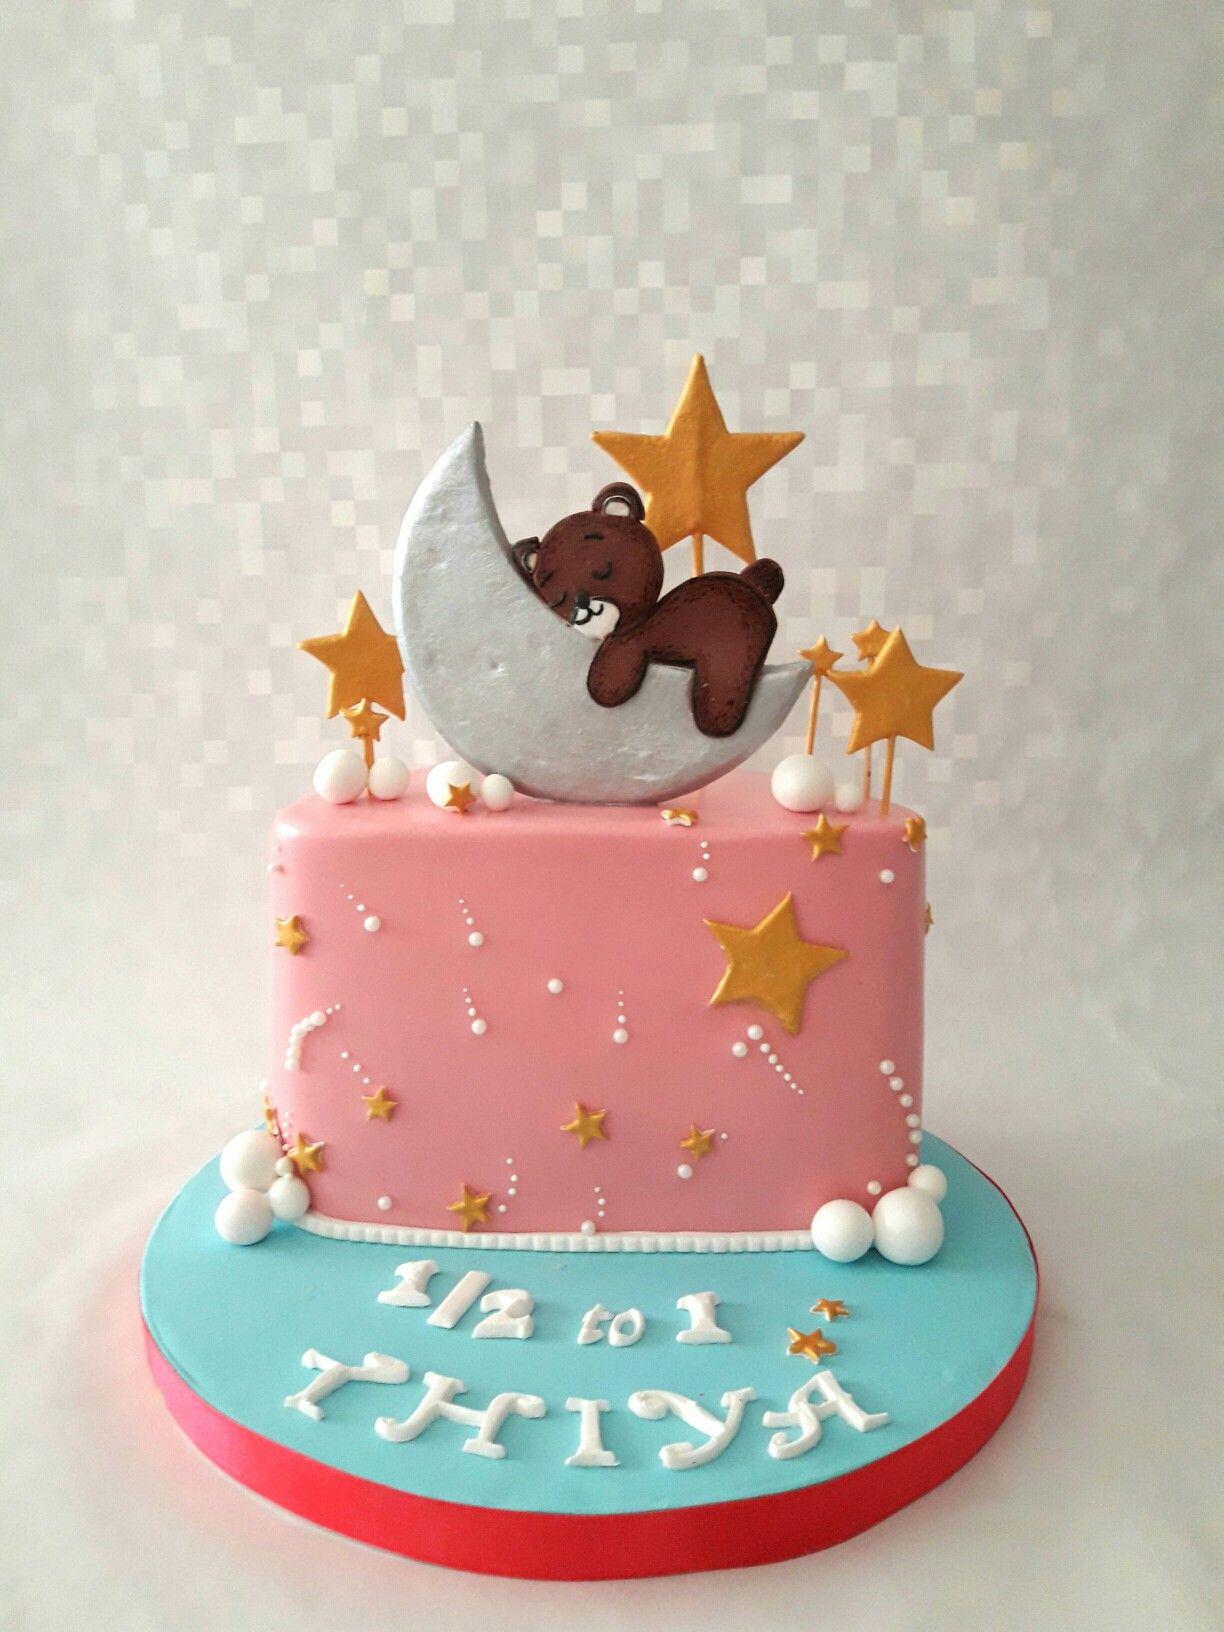 6months Celebration Cake Half Birthday Cakes Baby Birthday Cakes Birthday Cakes For Men